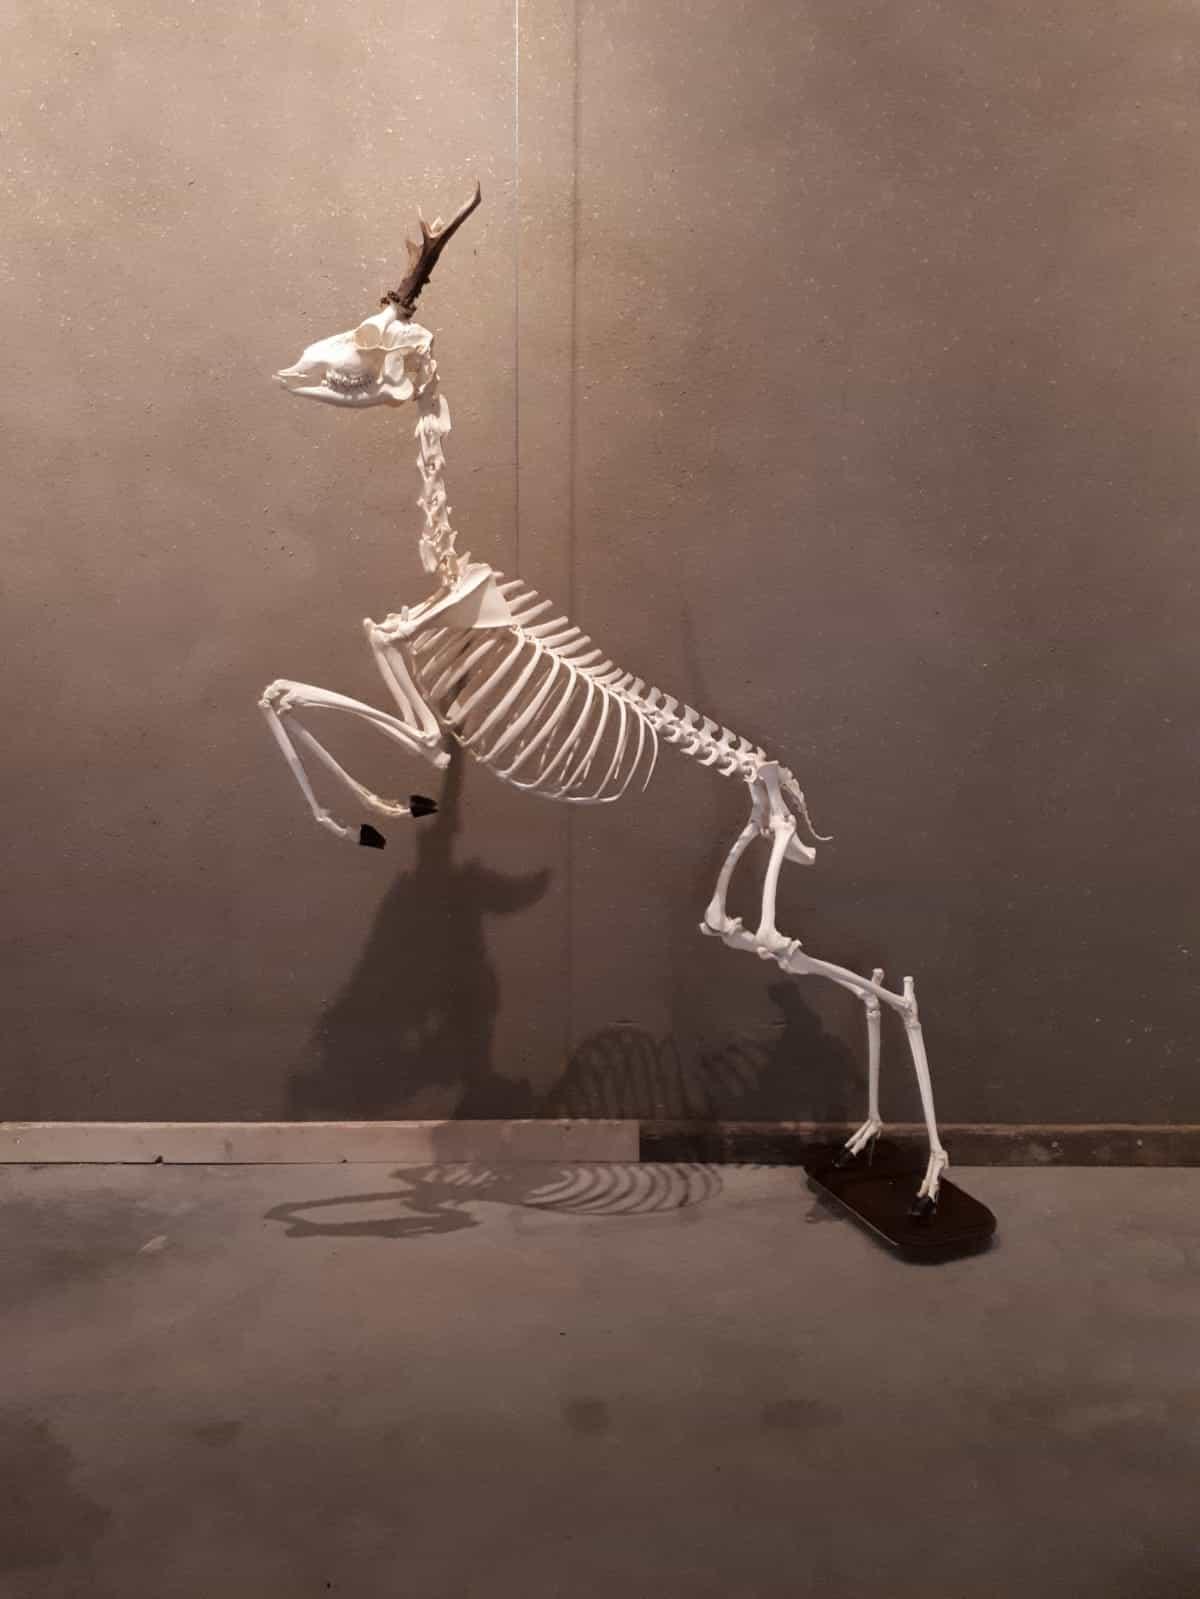 Skelette | springender Hirsch | Limburghuis GAIA Zoo